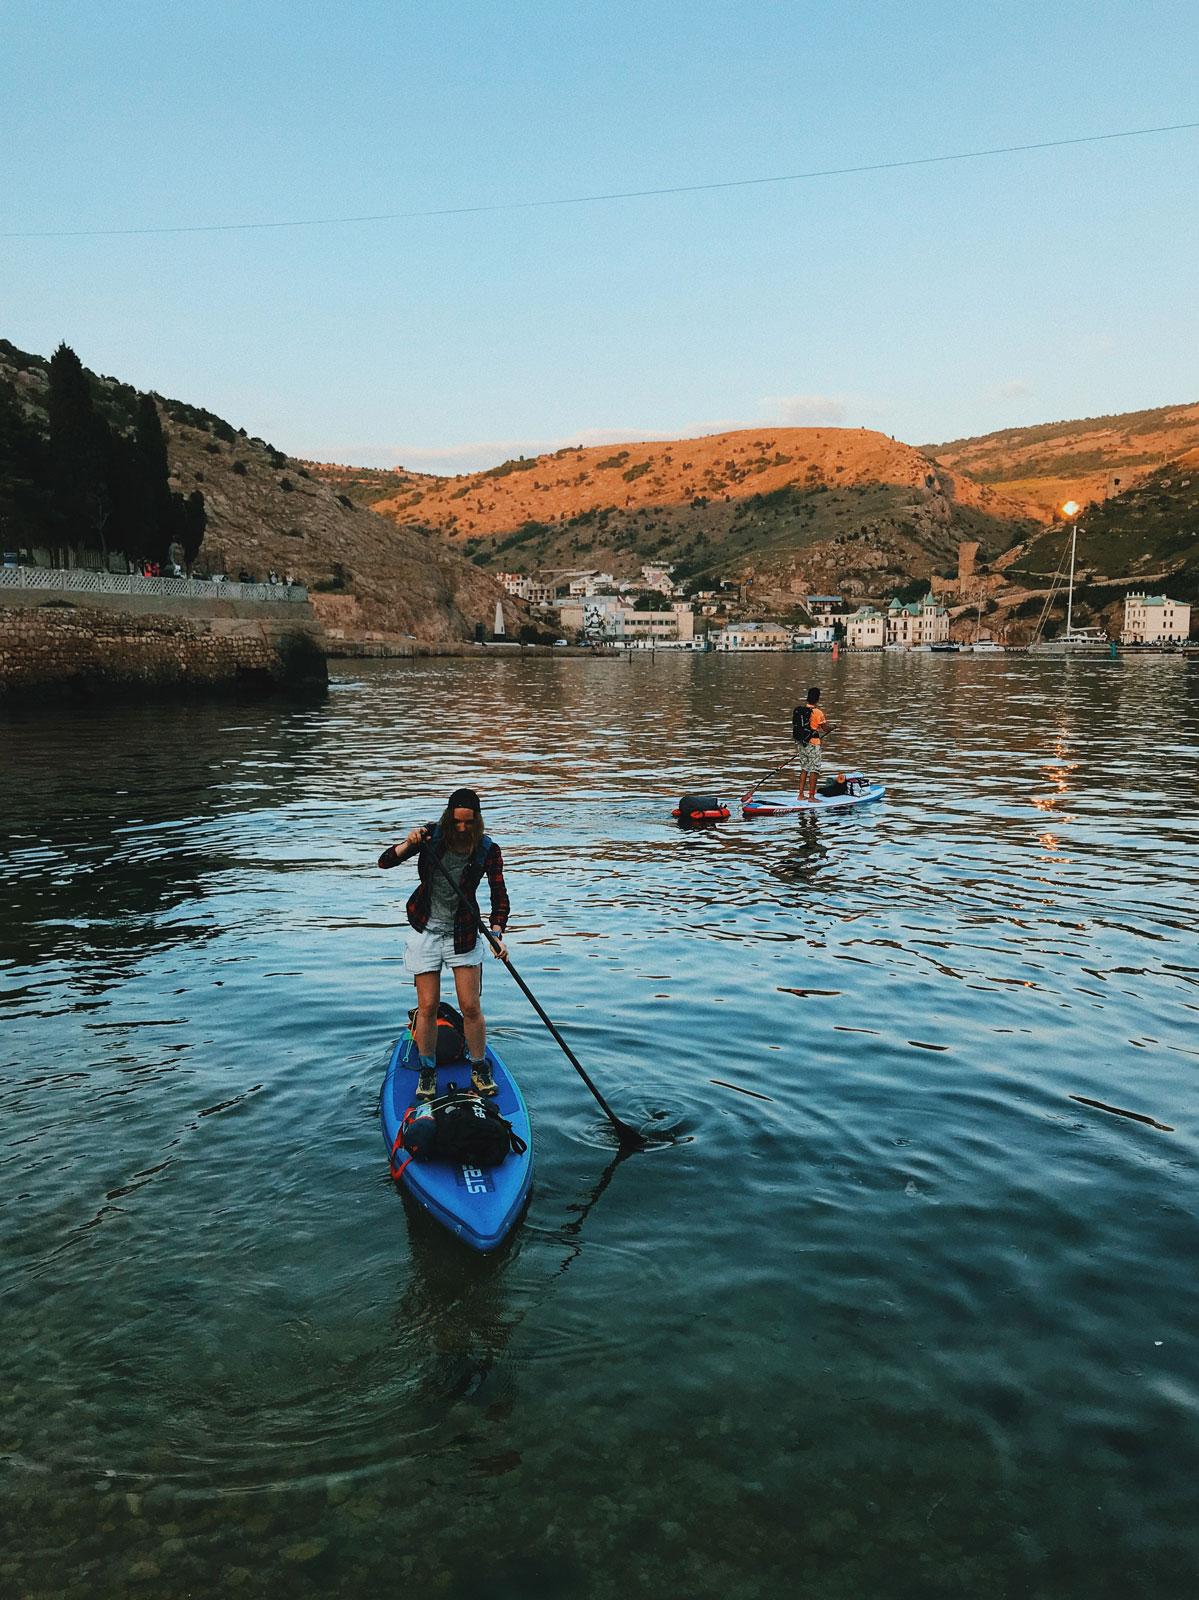 julia-karpacheva-paddleboarding-russia-black-sea-paddling